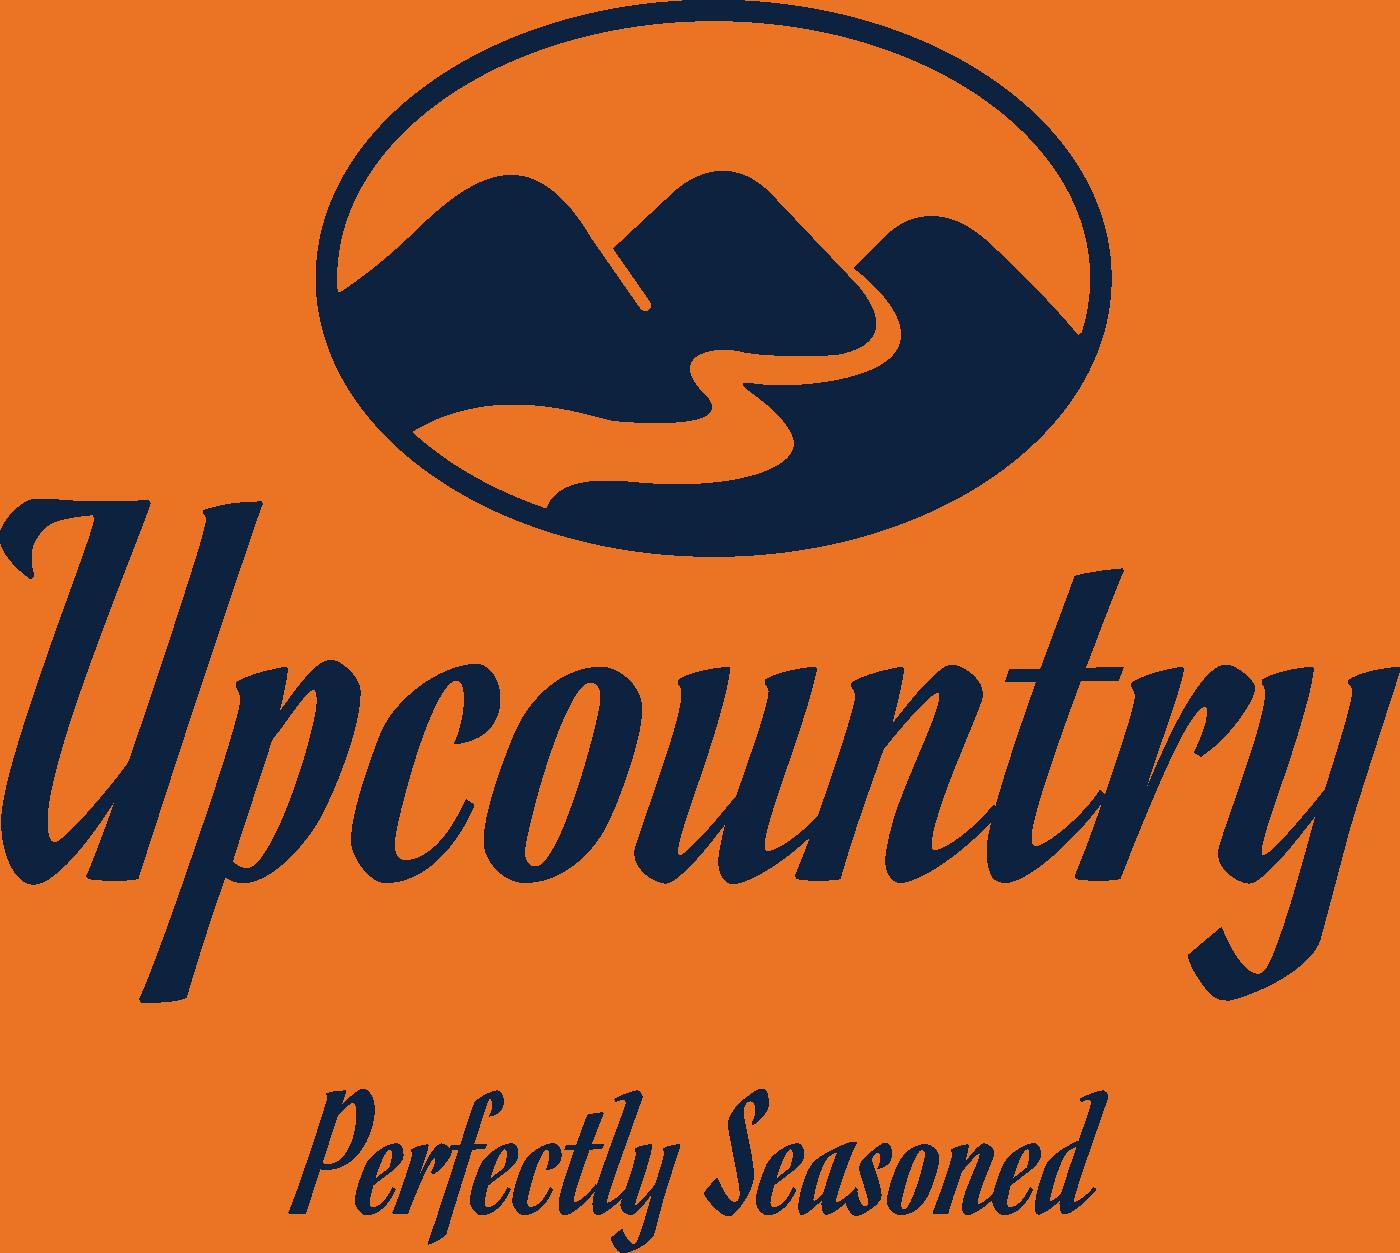 Uc Logo Colornewoutlines102416 1